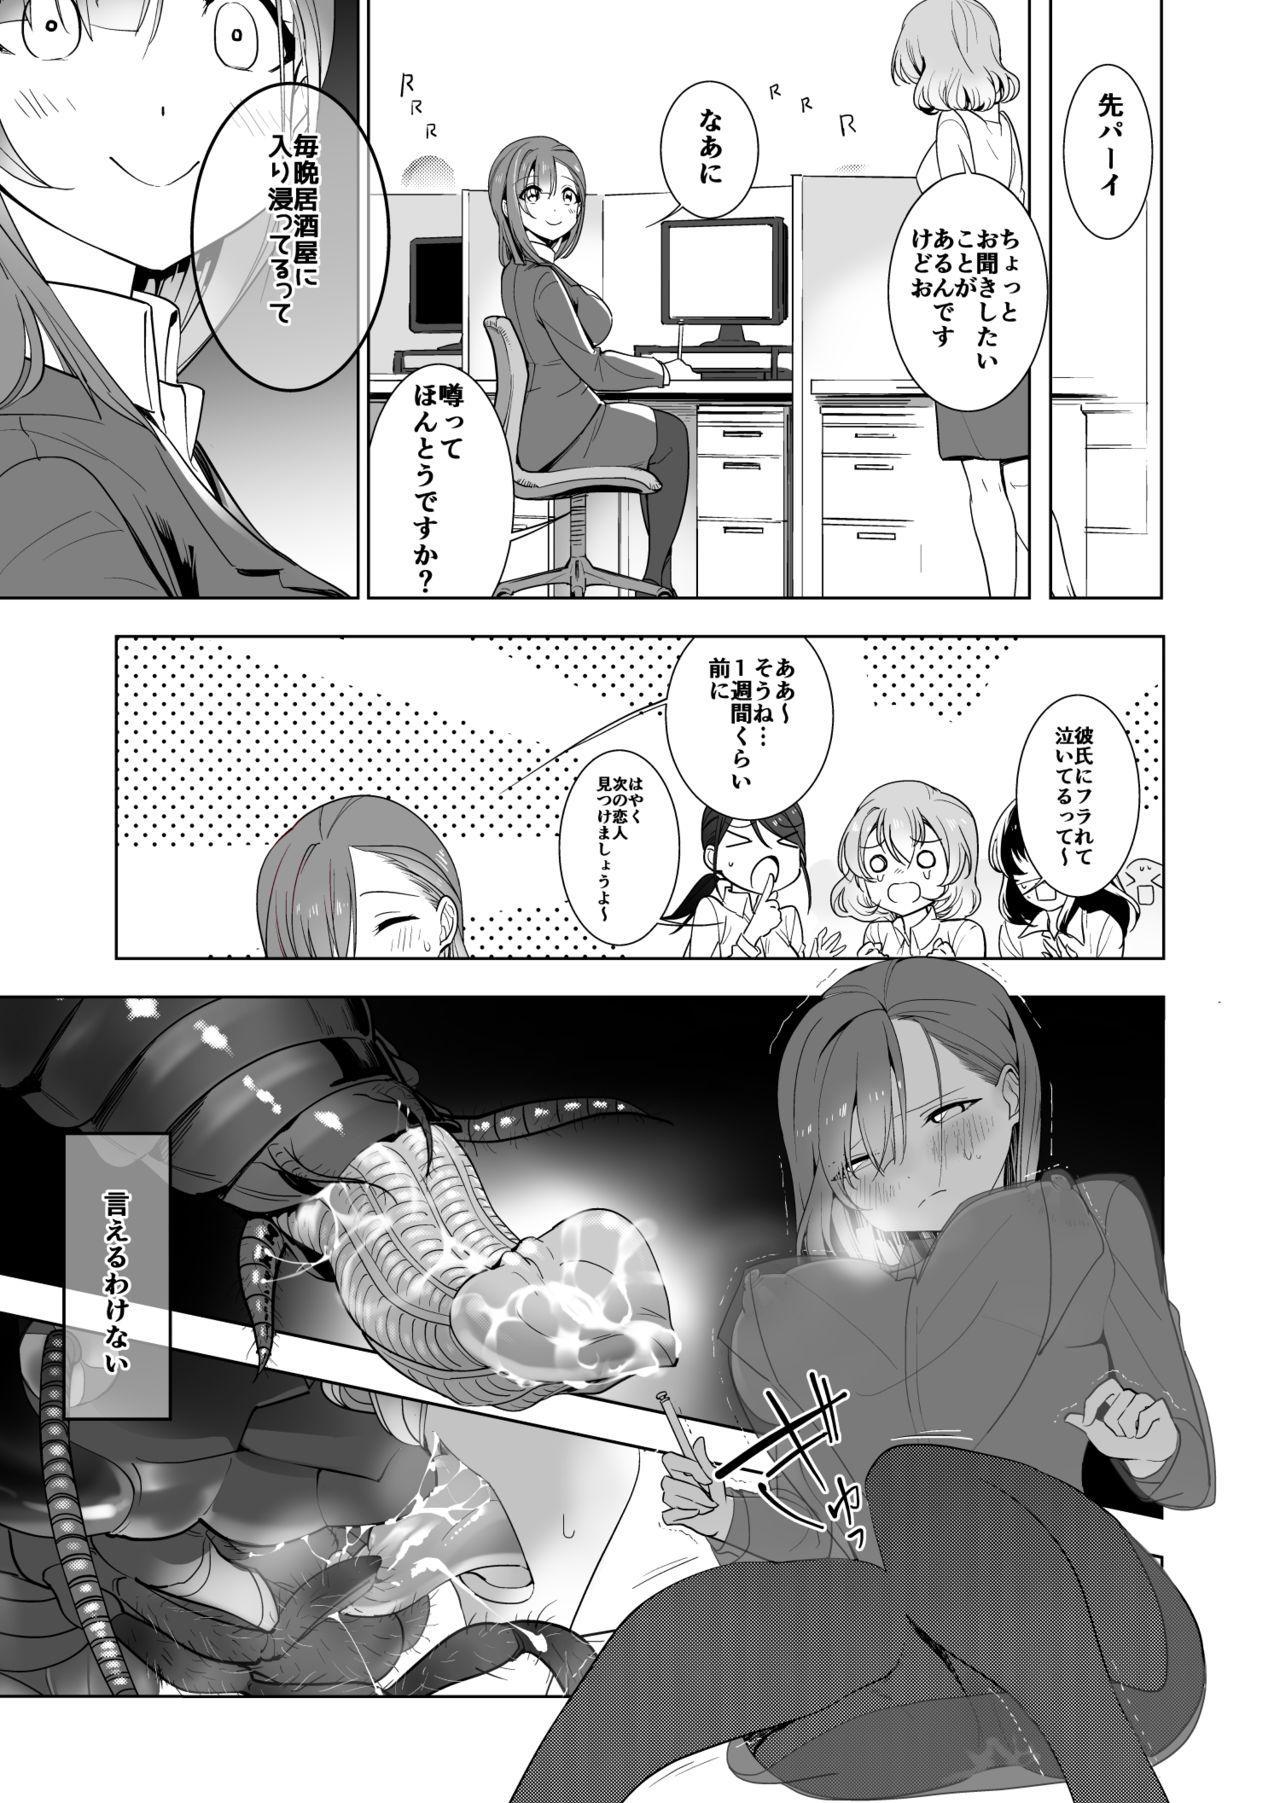 Izakaya no Aiseki 10